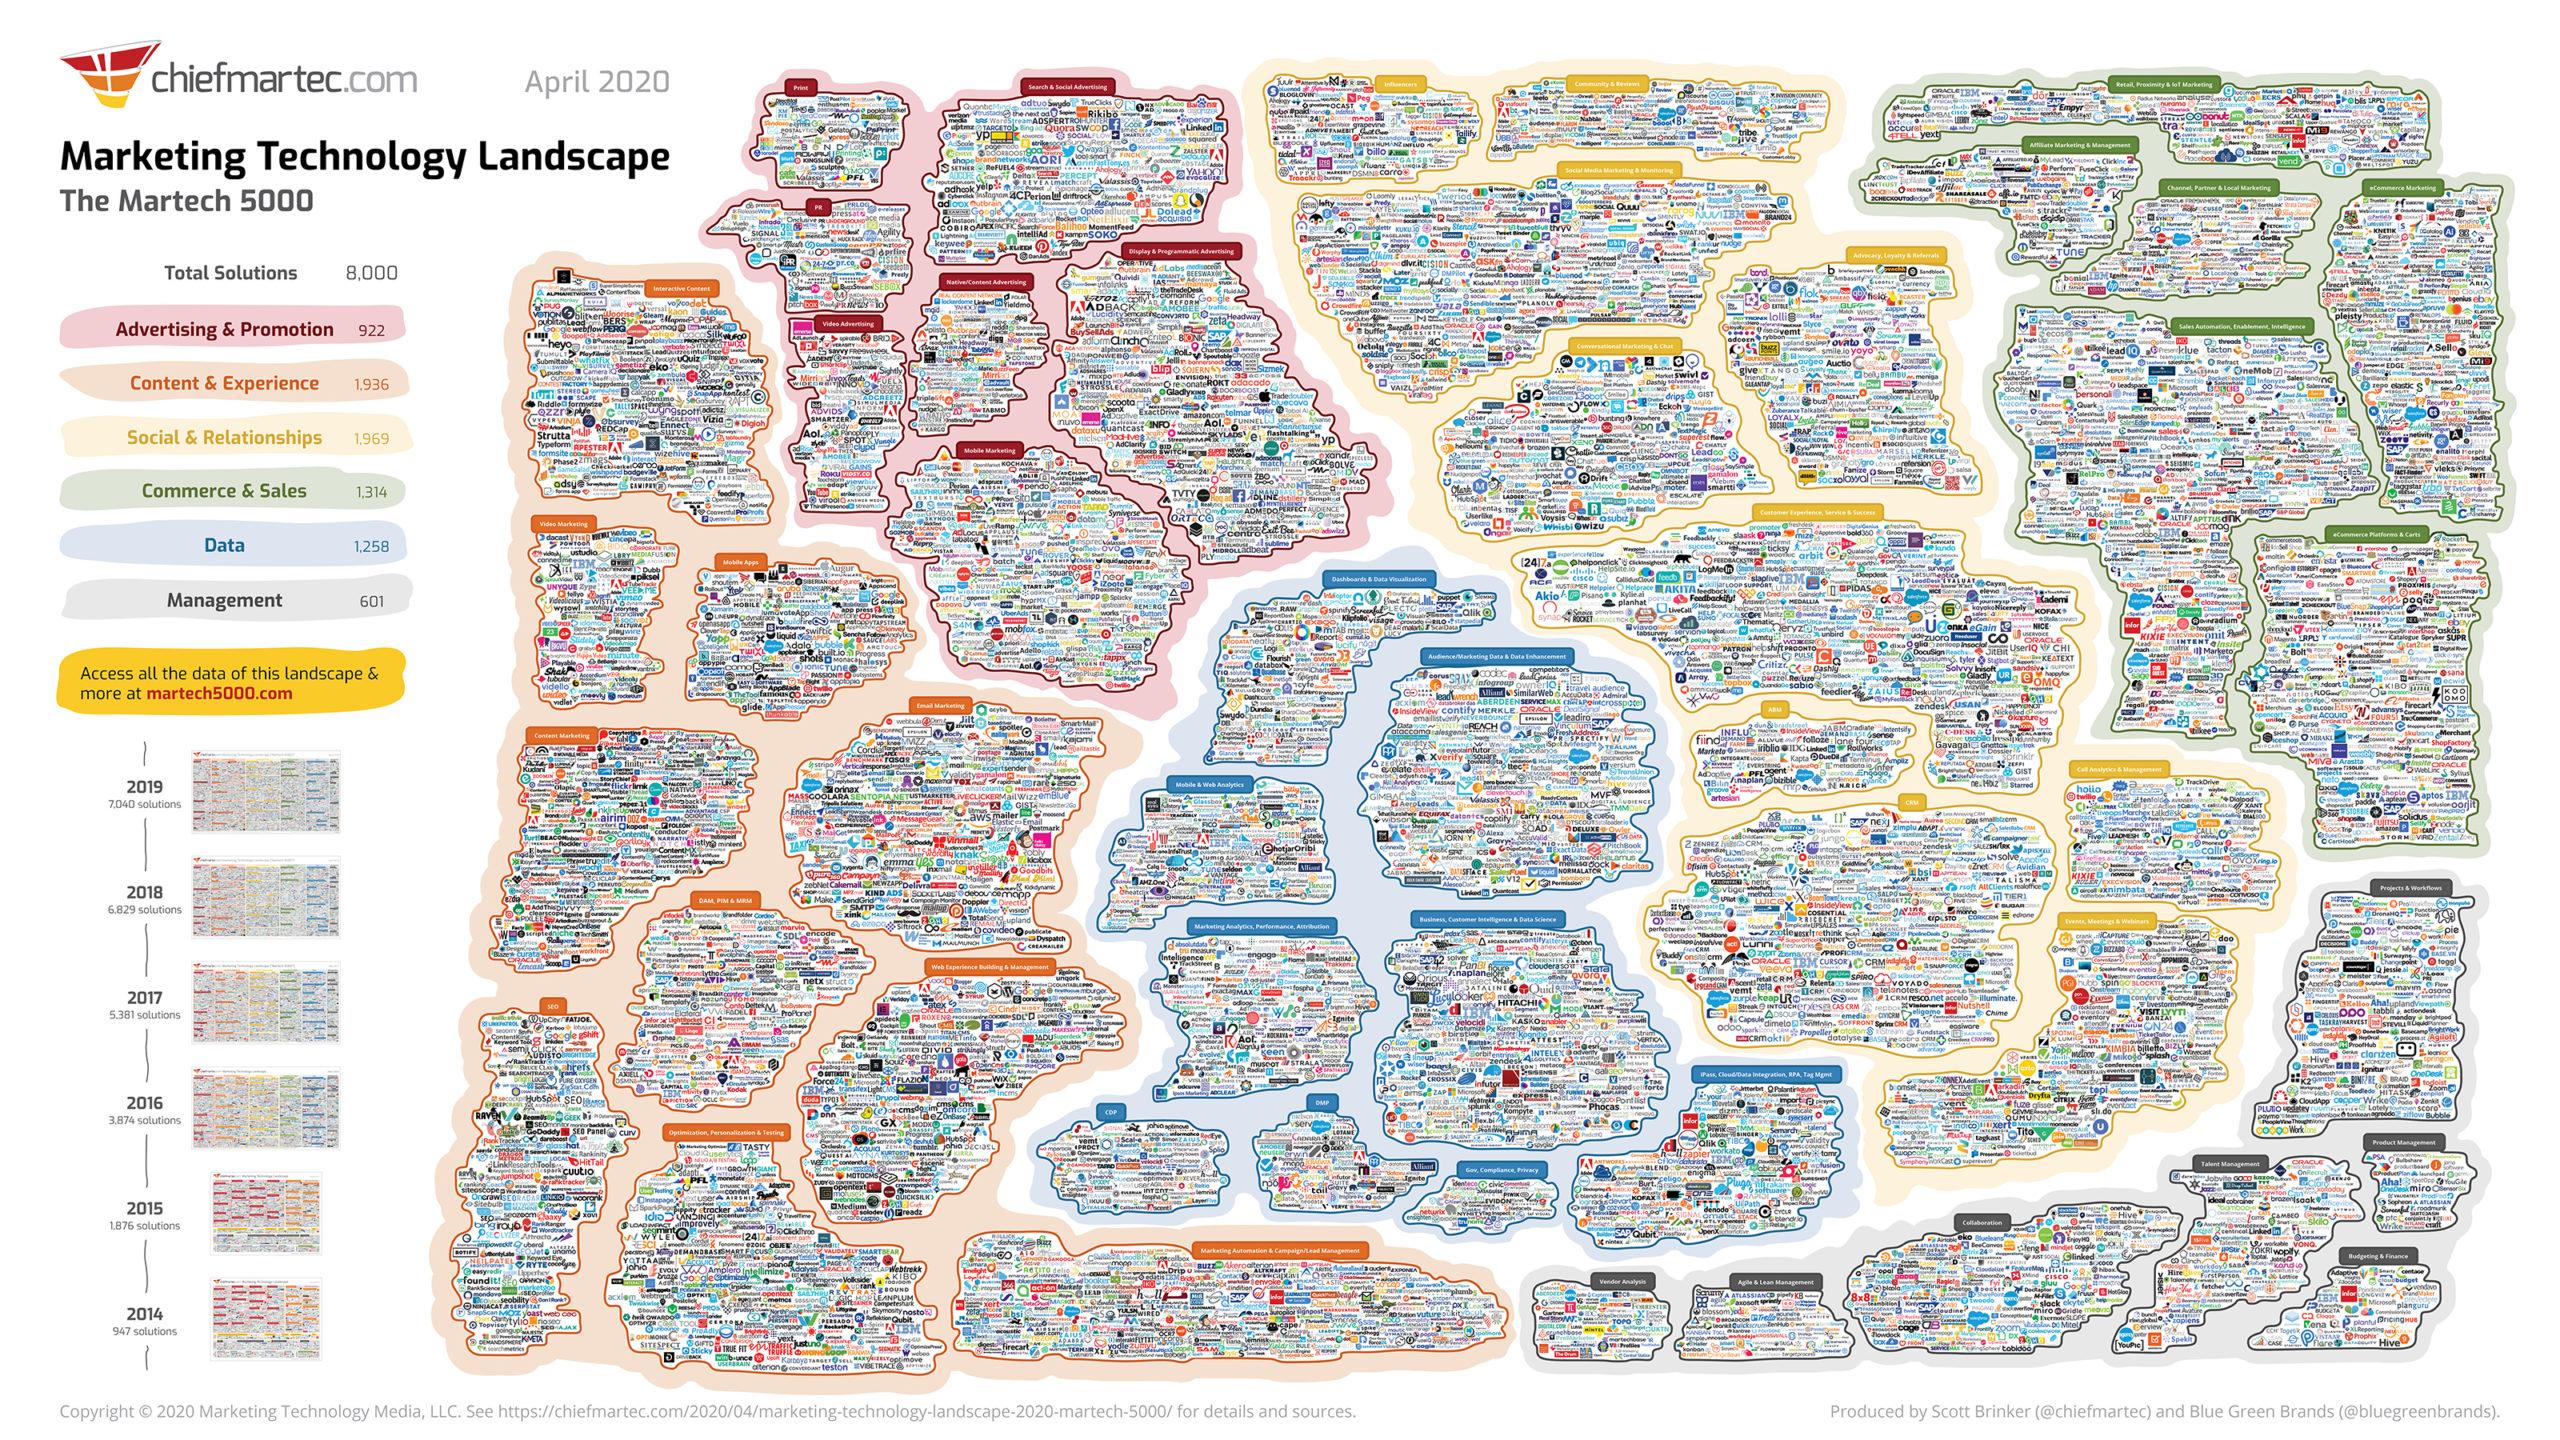 Edmonton Digital Marketing Agency Marketing Technology Landscape from Martech 2020 Digital Marketing Conference